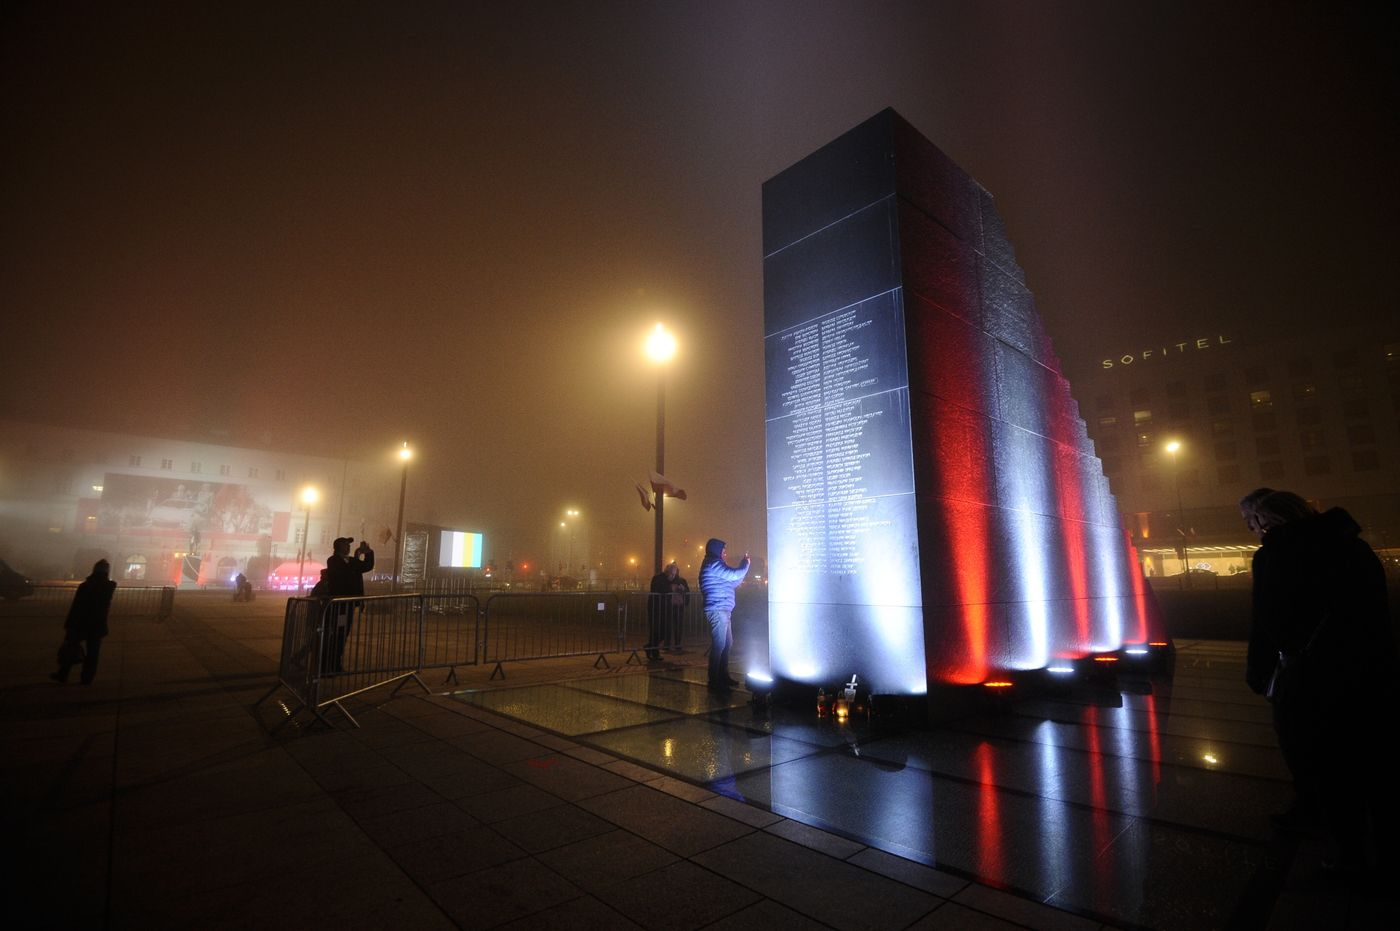 Lech Kaczynski Monument In Warsaw